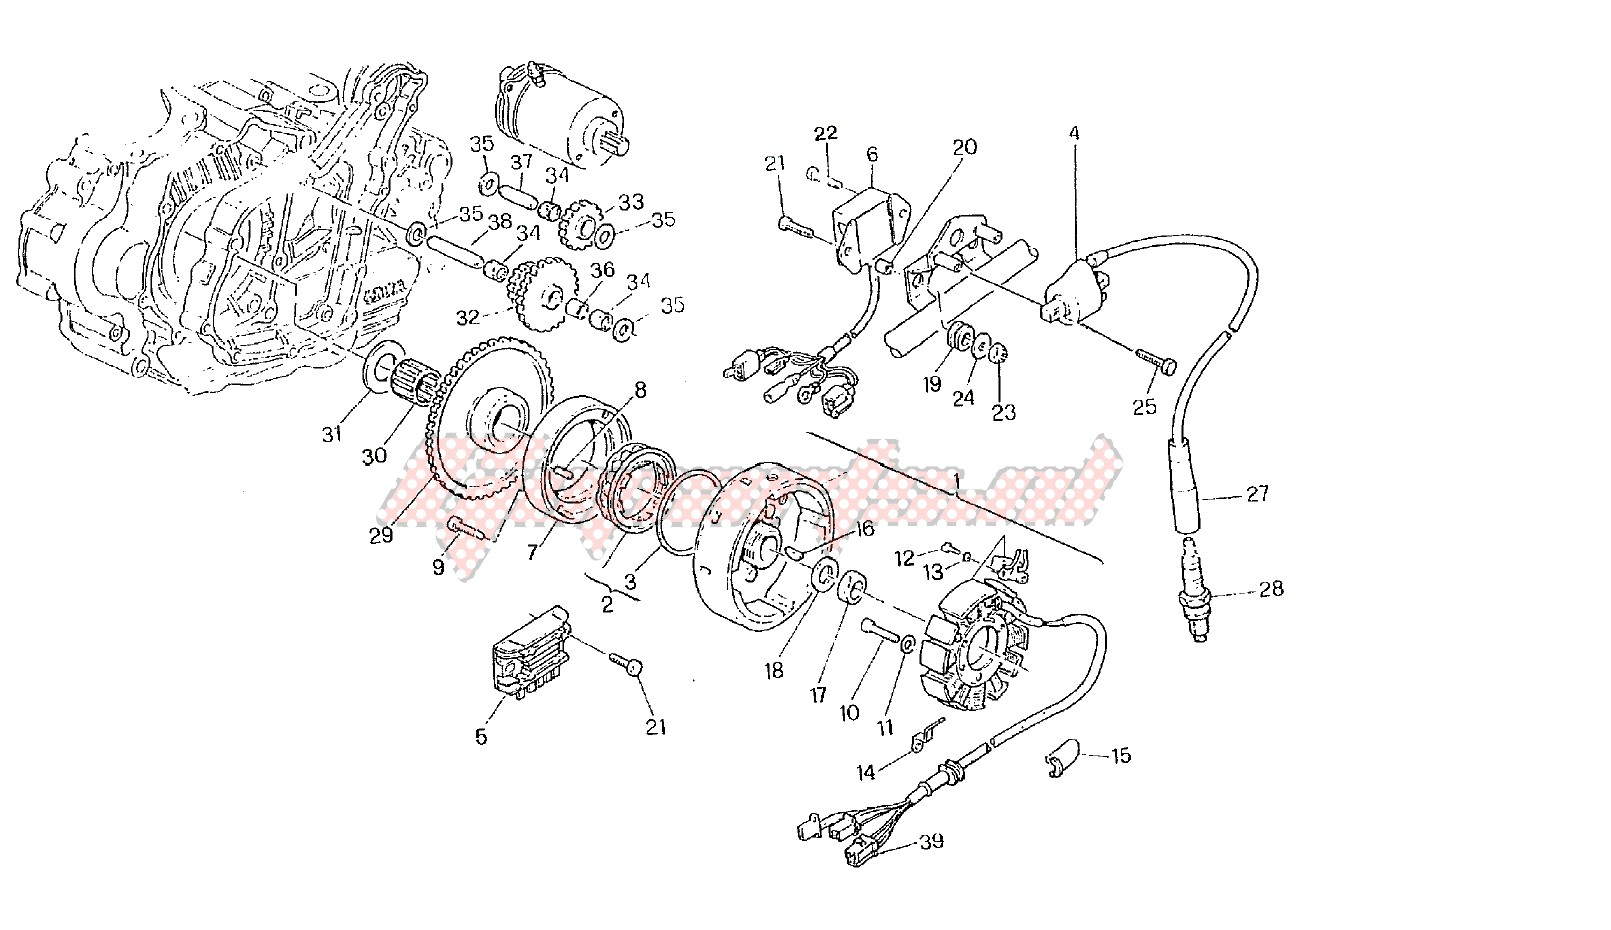 w12 engine diagram oem generator  cagiva  motorcycle  w12 350 1994  goparts  cagiva  motorcycle  w12 350